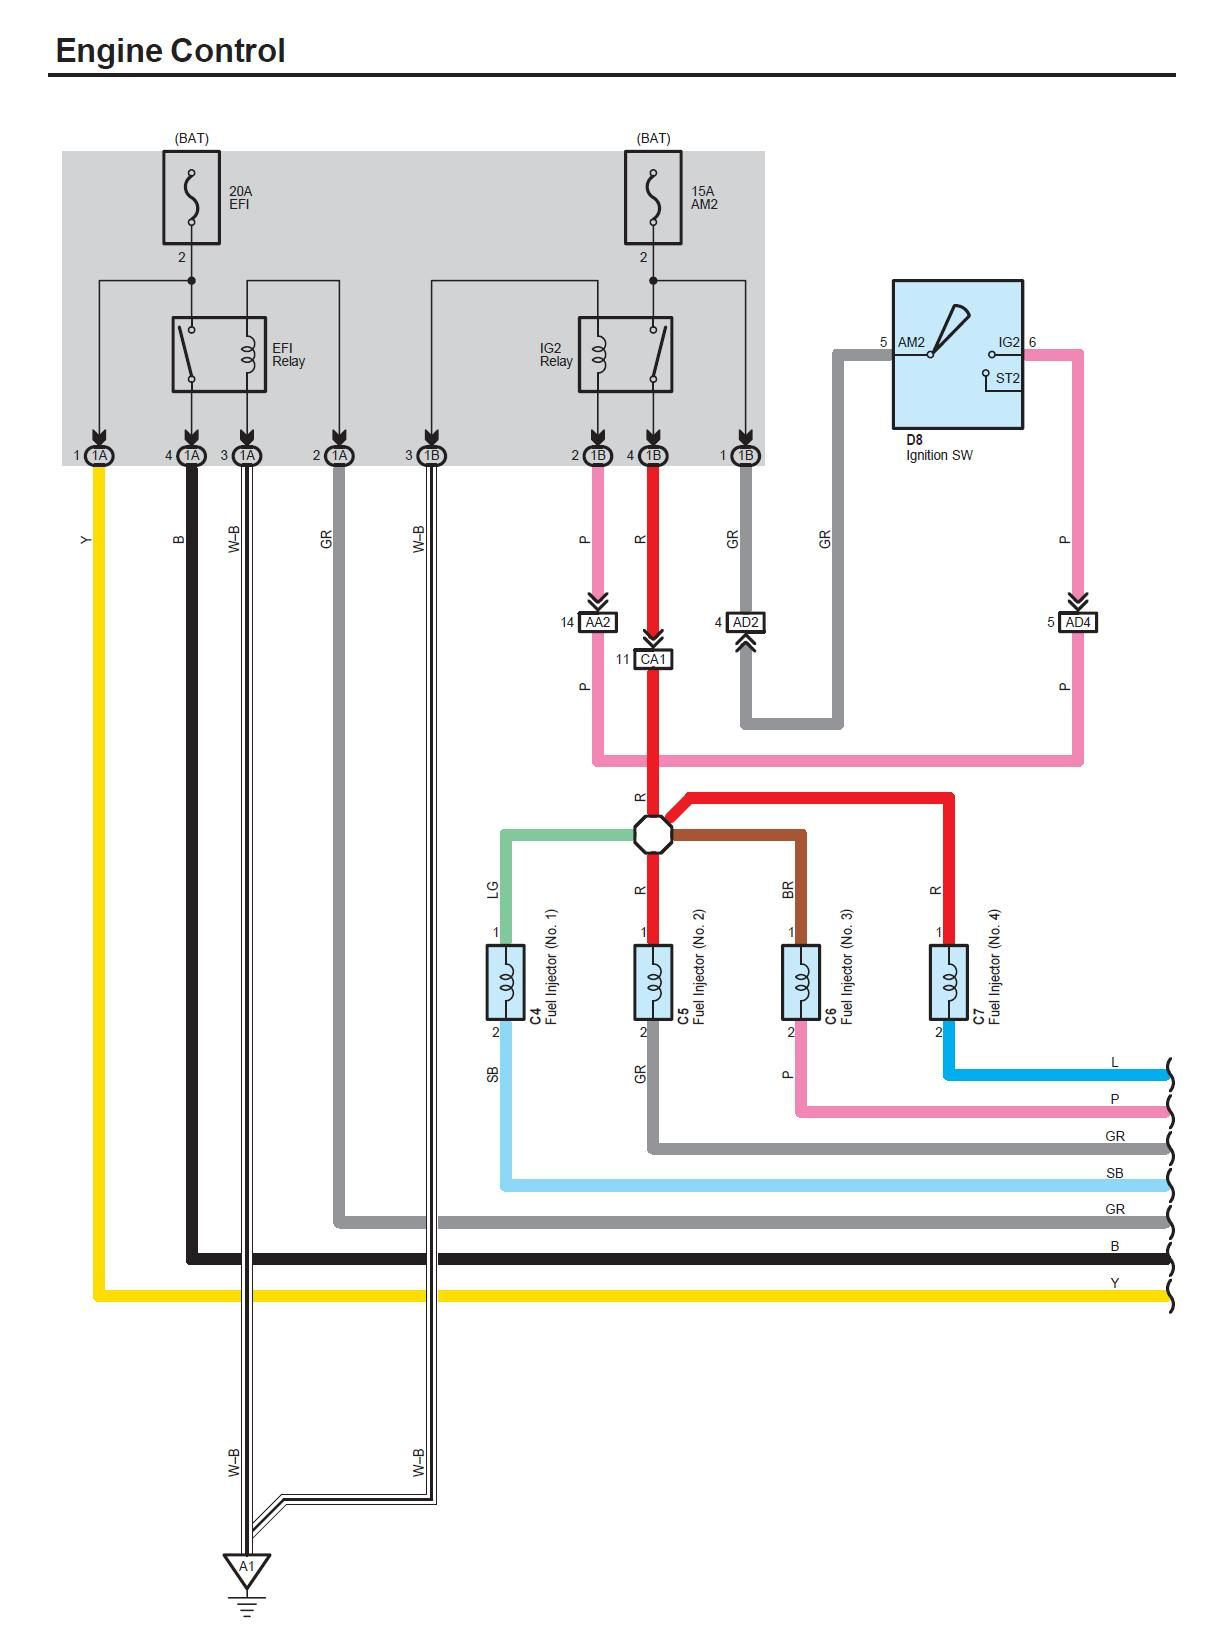 2007 Toyota Yaris Engine Wiring Diagram | My Car Parts